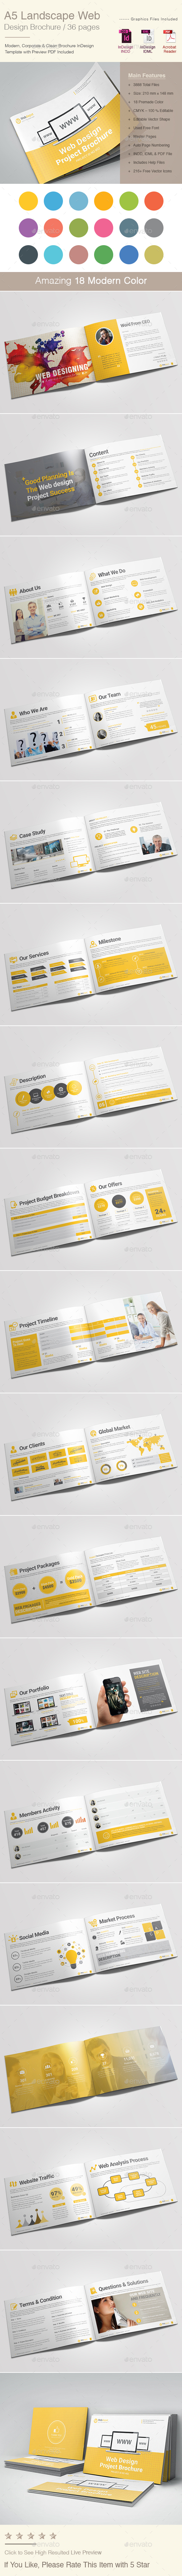 A5 Landscape Web Design Brochure - Corporate Brochures